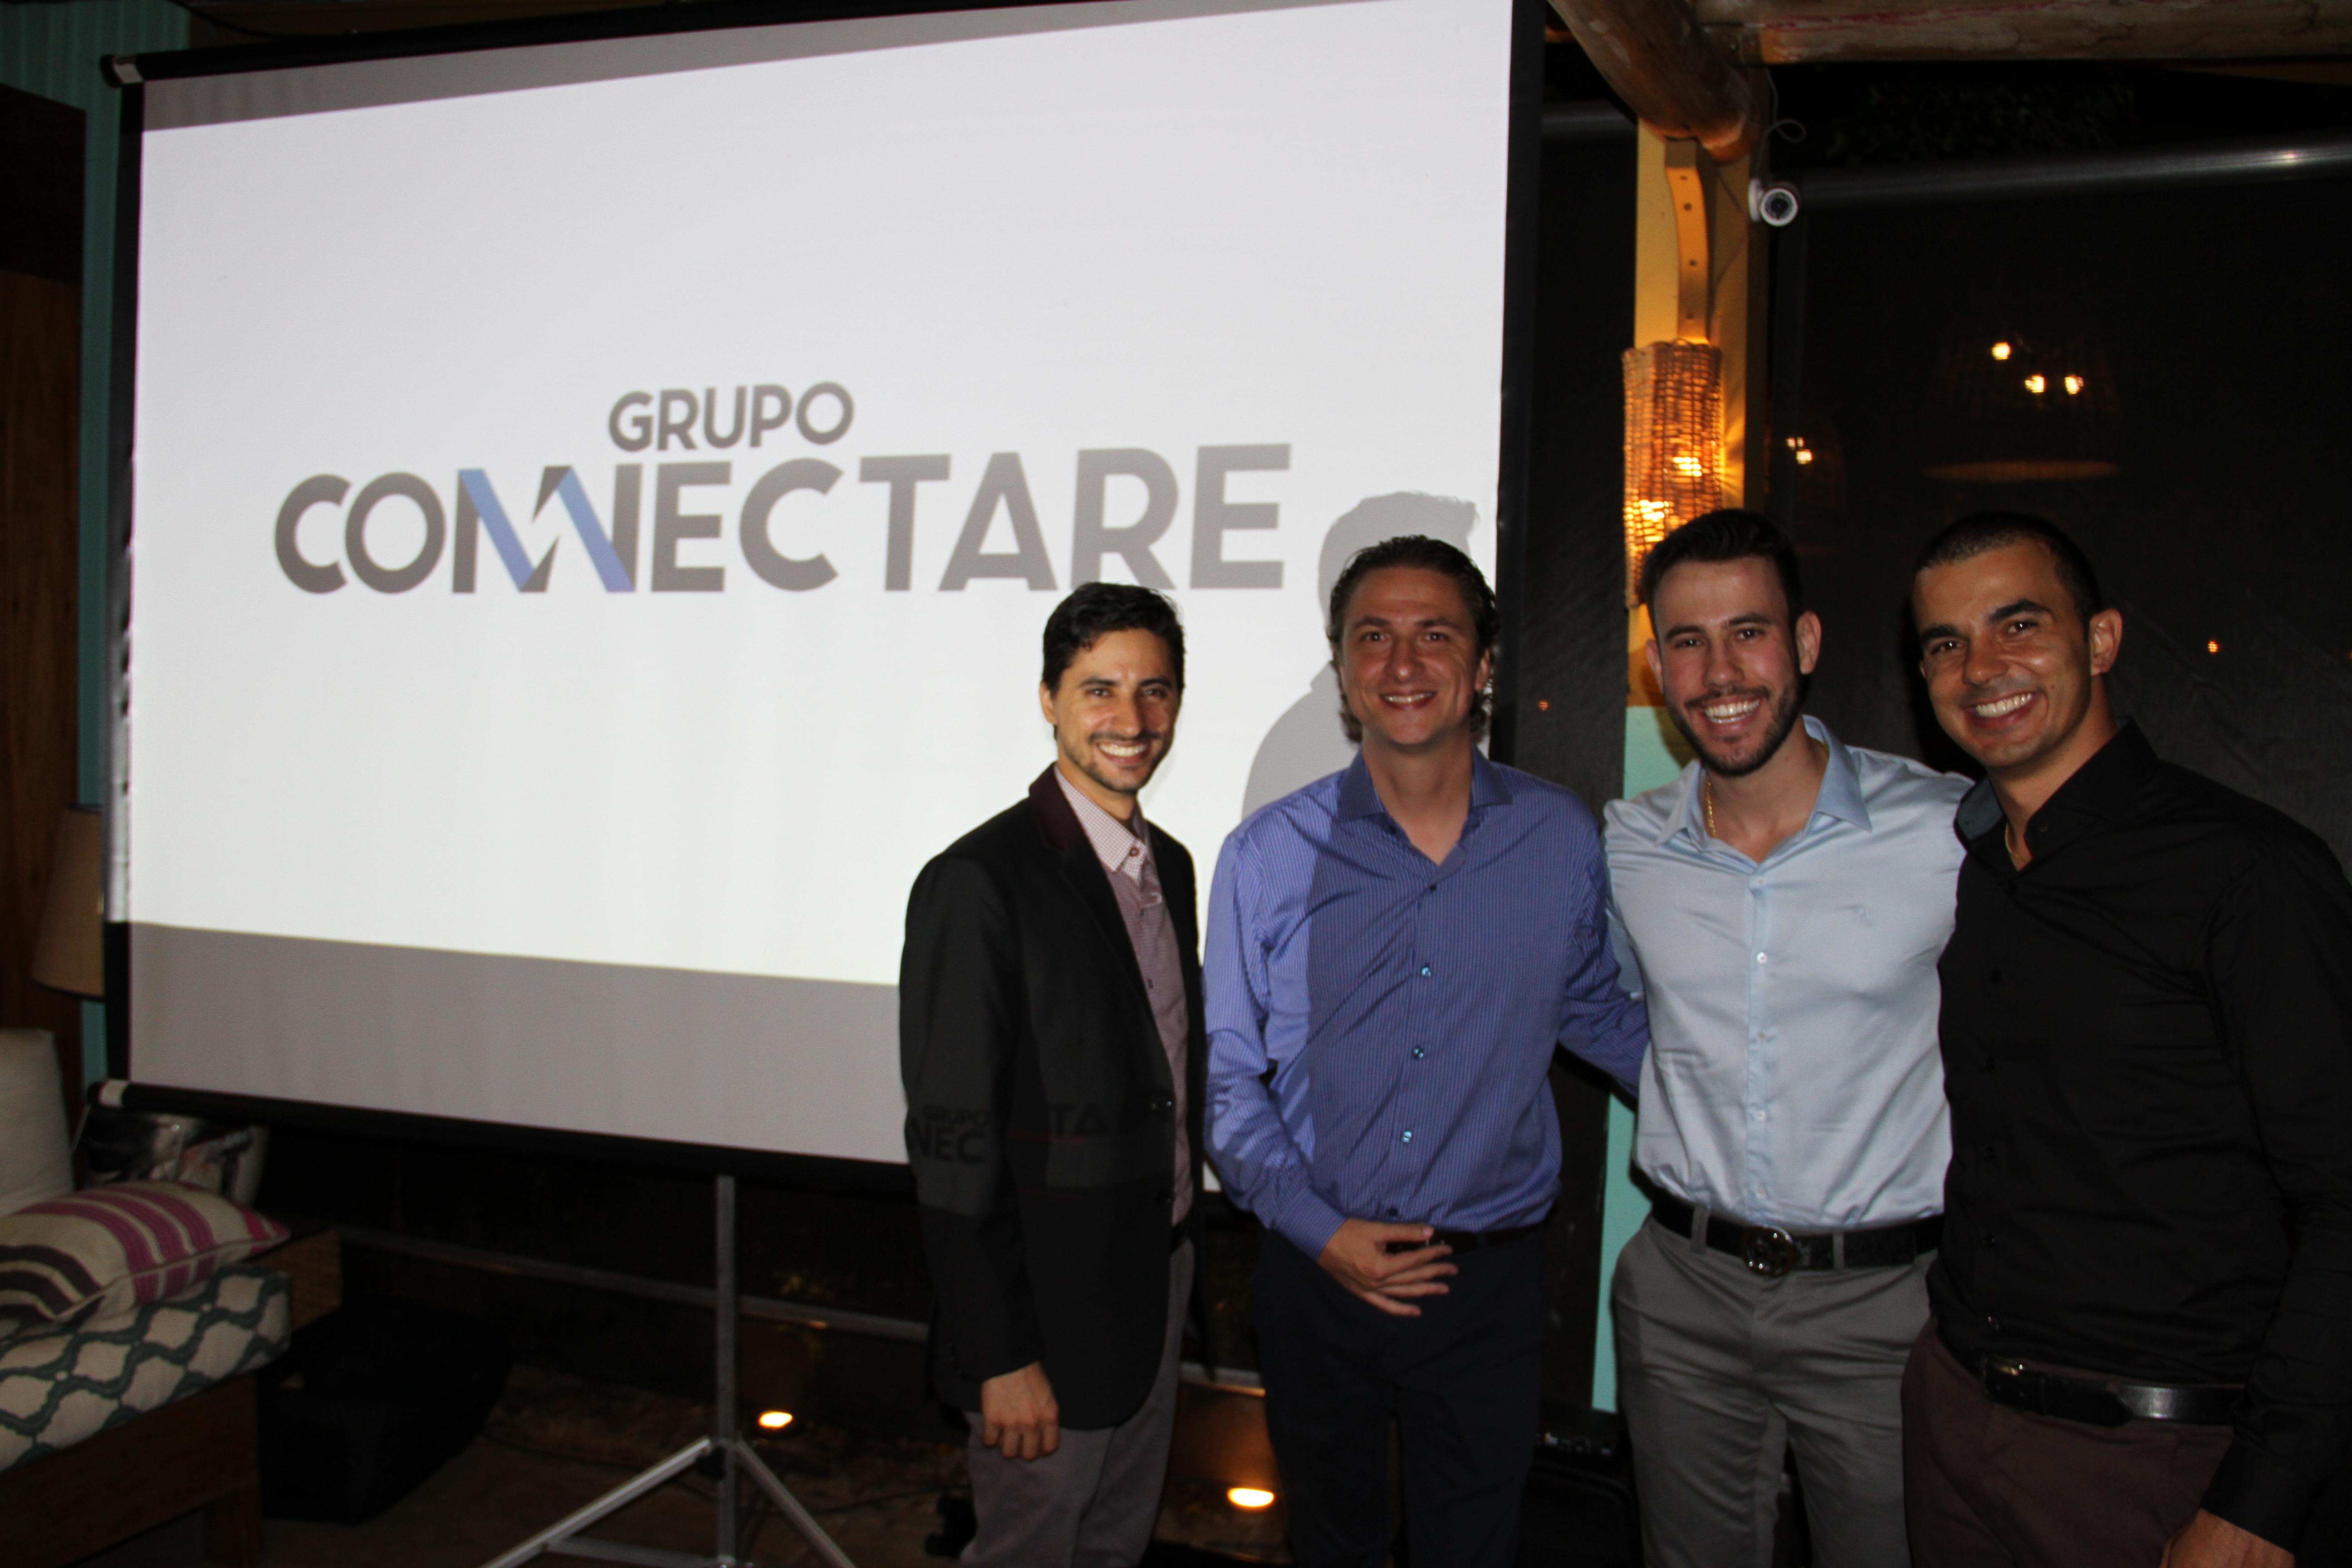 Sallva Network - Grupo Connectare